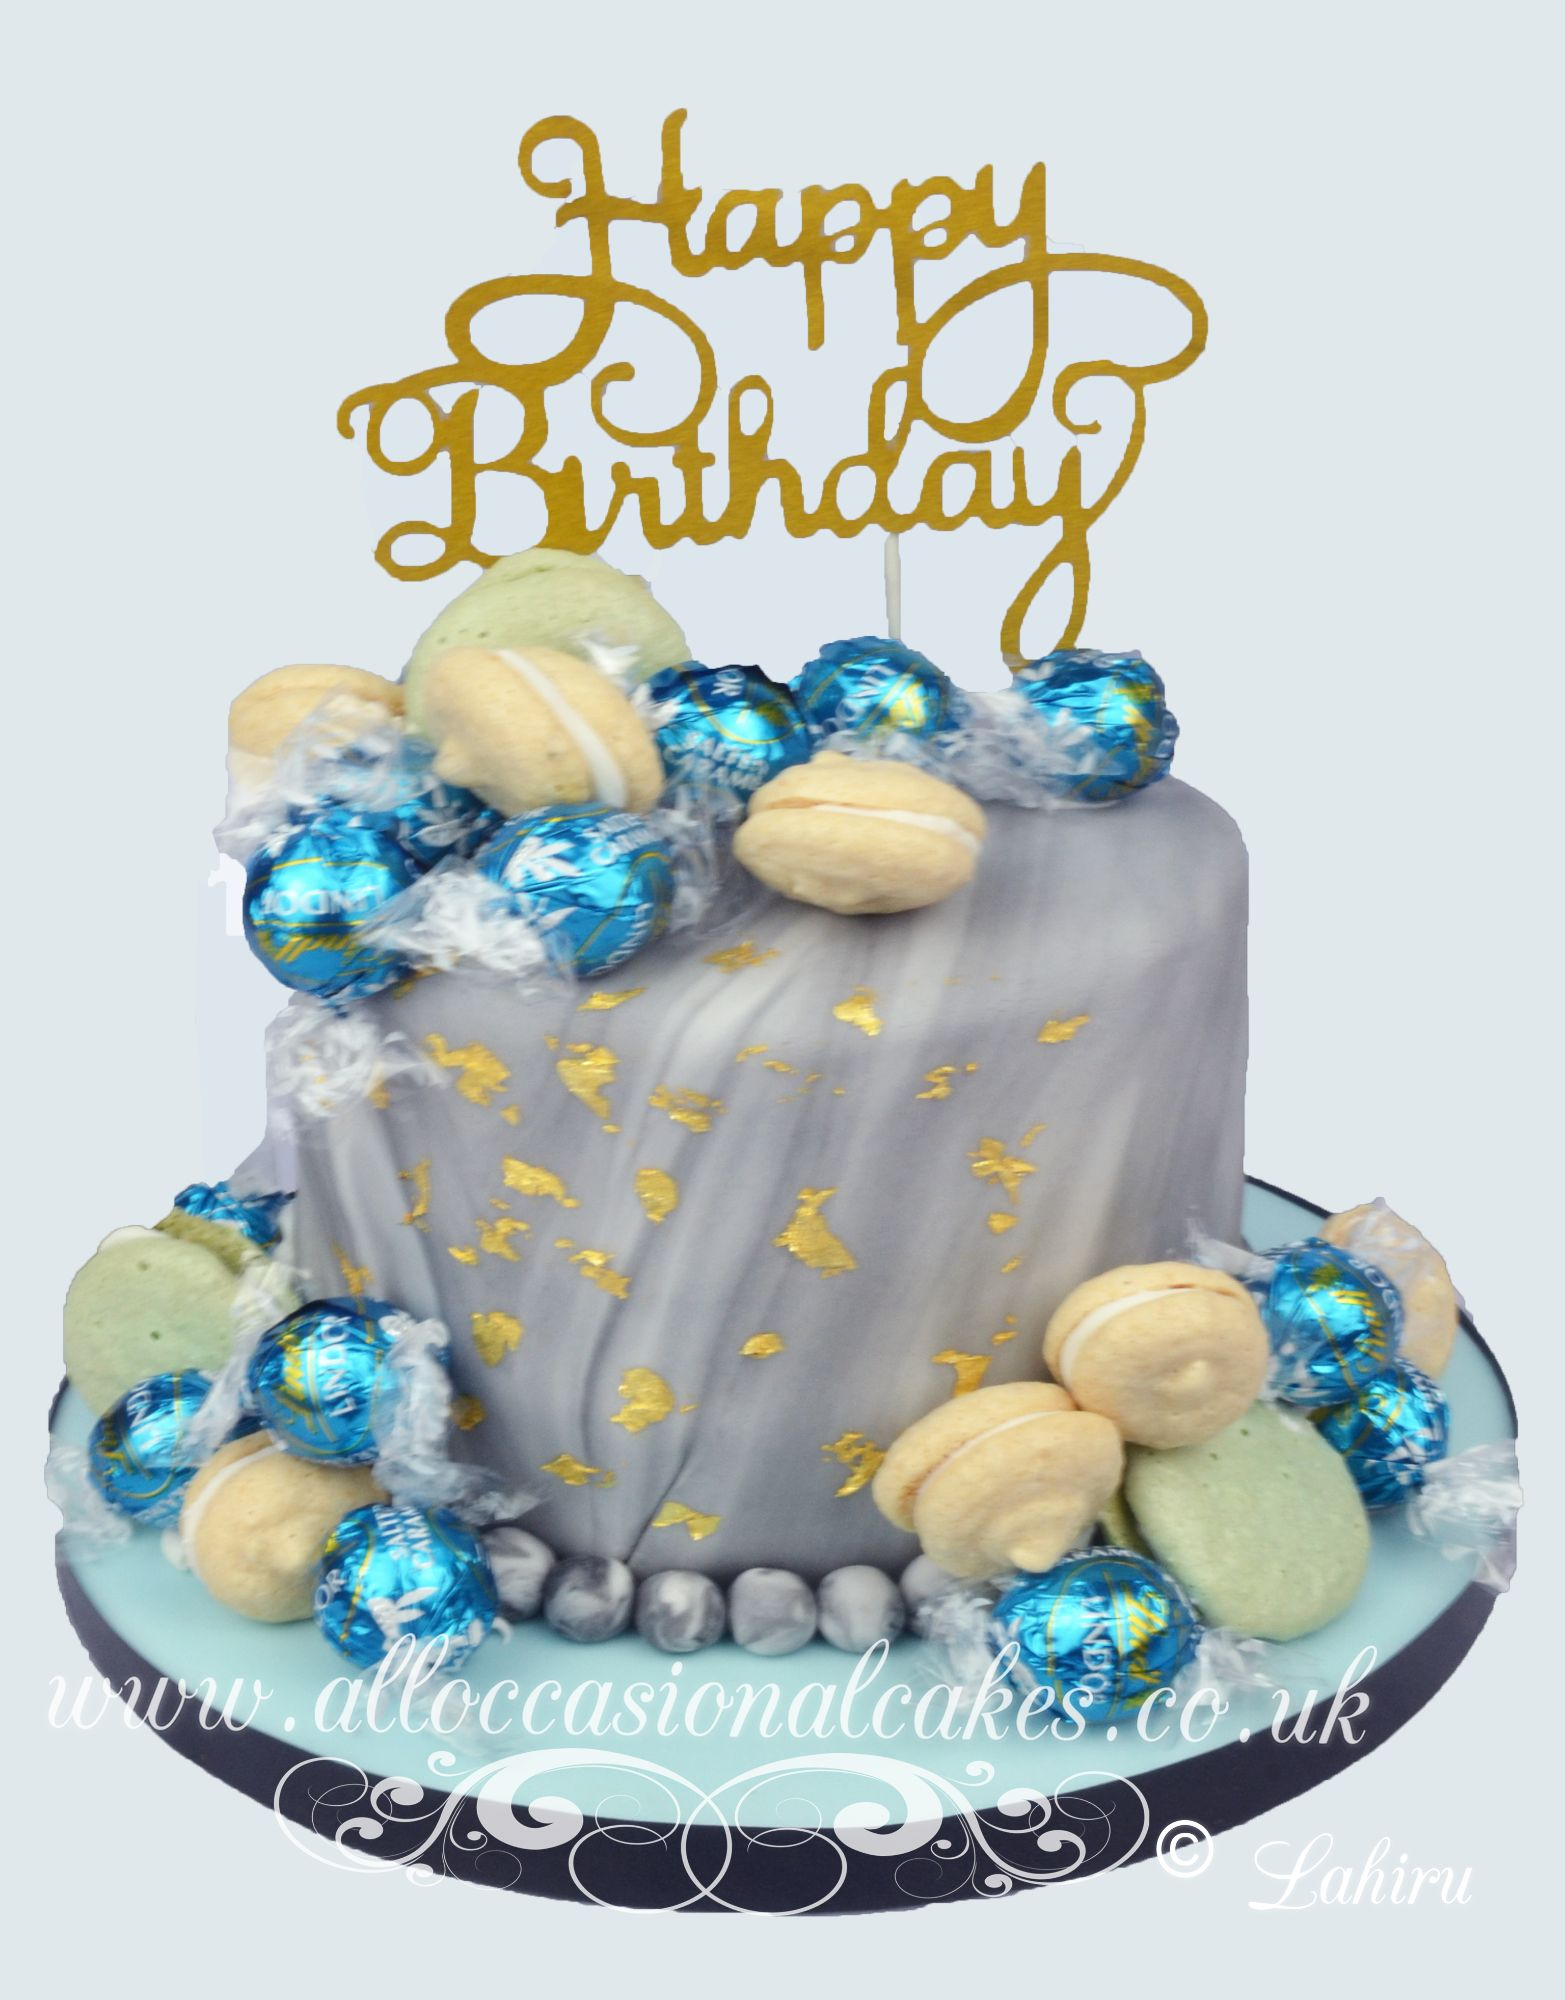 macaroons and gold leaf birthday cake   flowers 1   flowers 1   gold leaf wedding cake